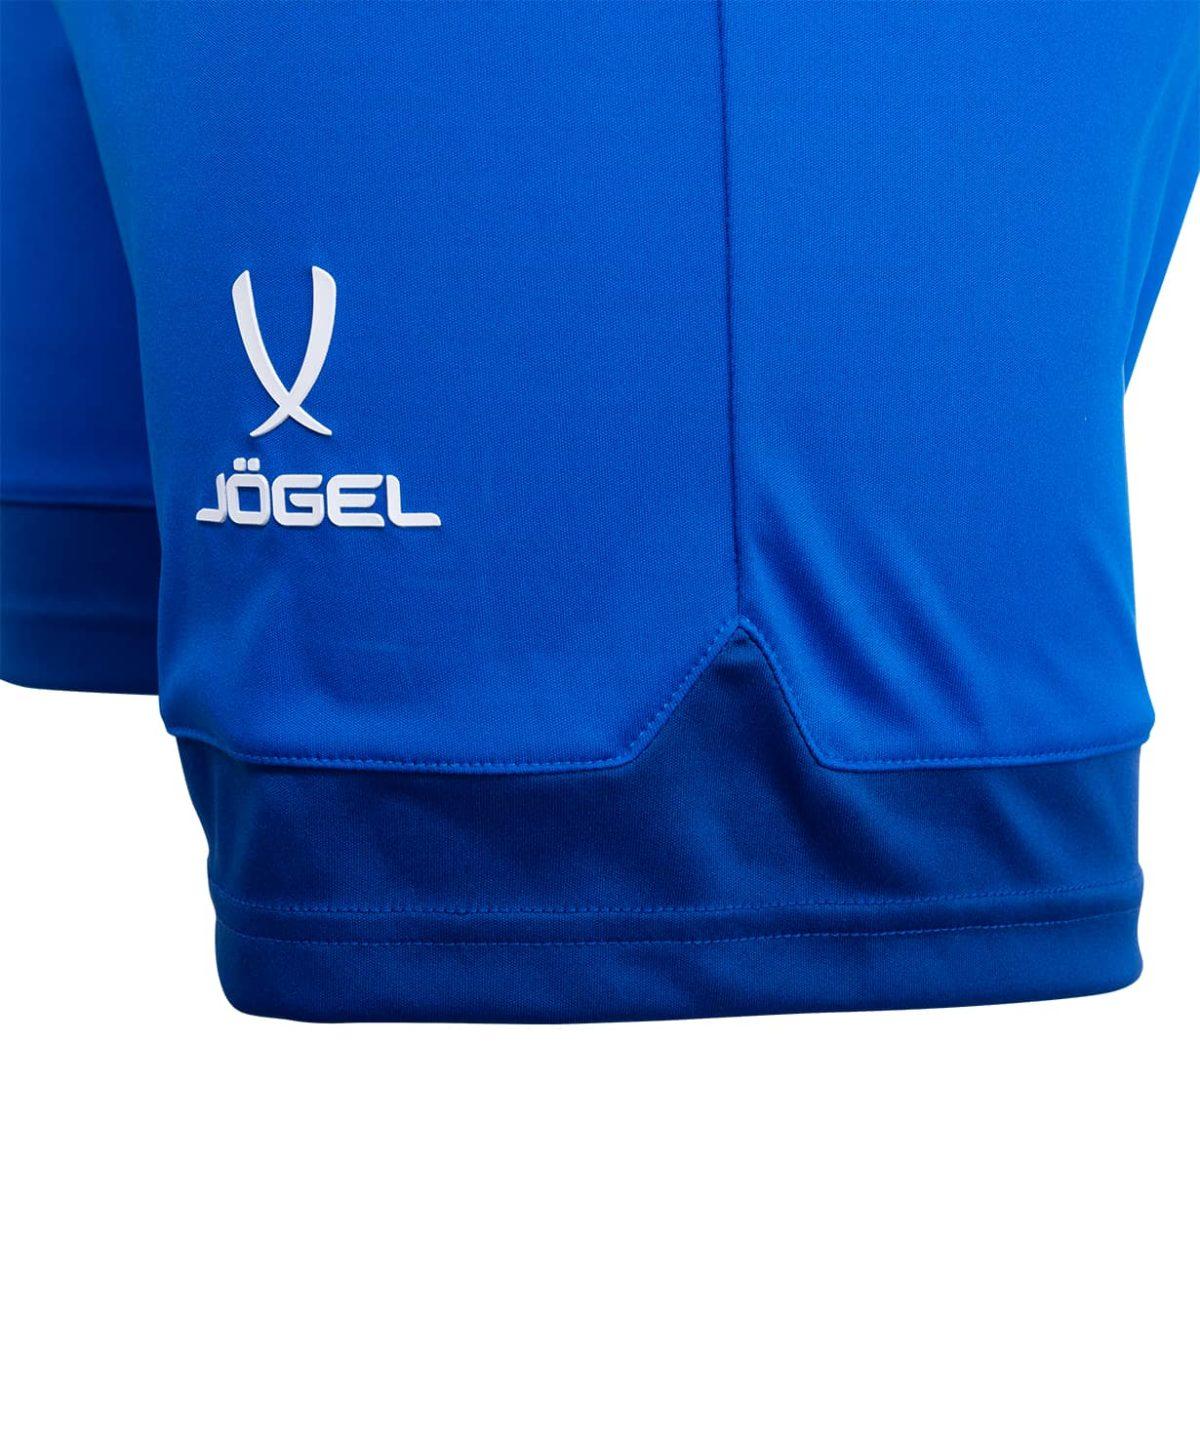 JOGEL DIVISION шорты футбольные  Union Shorts - 3